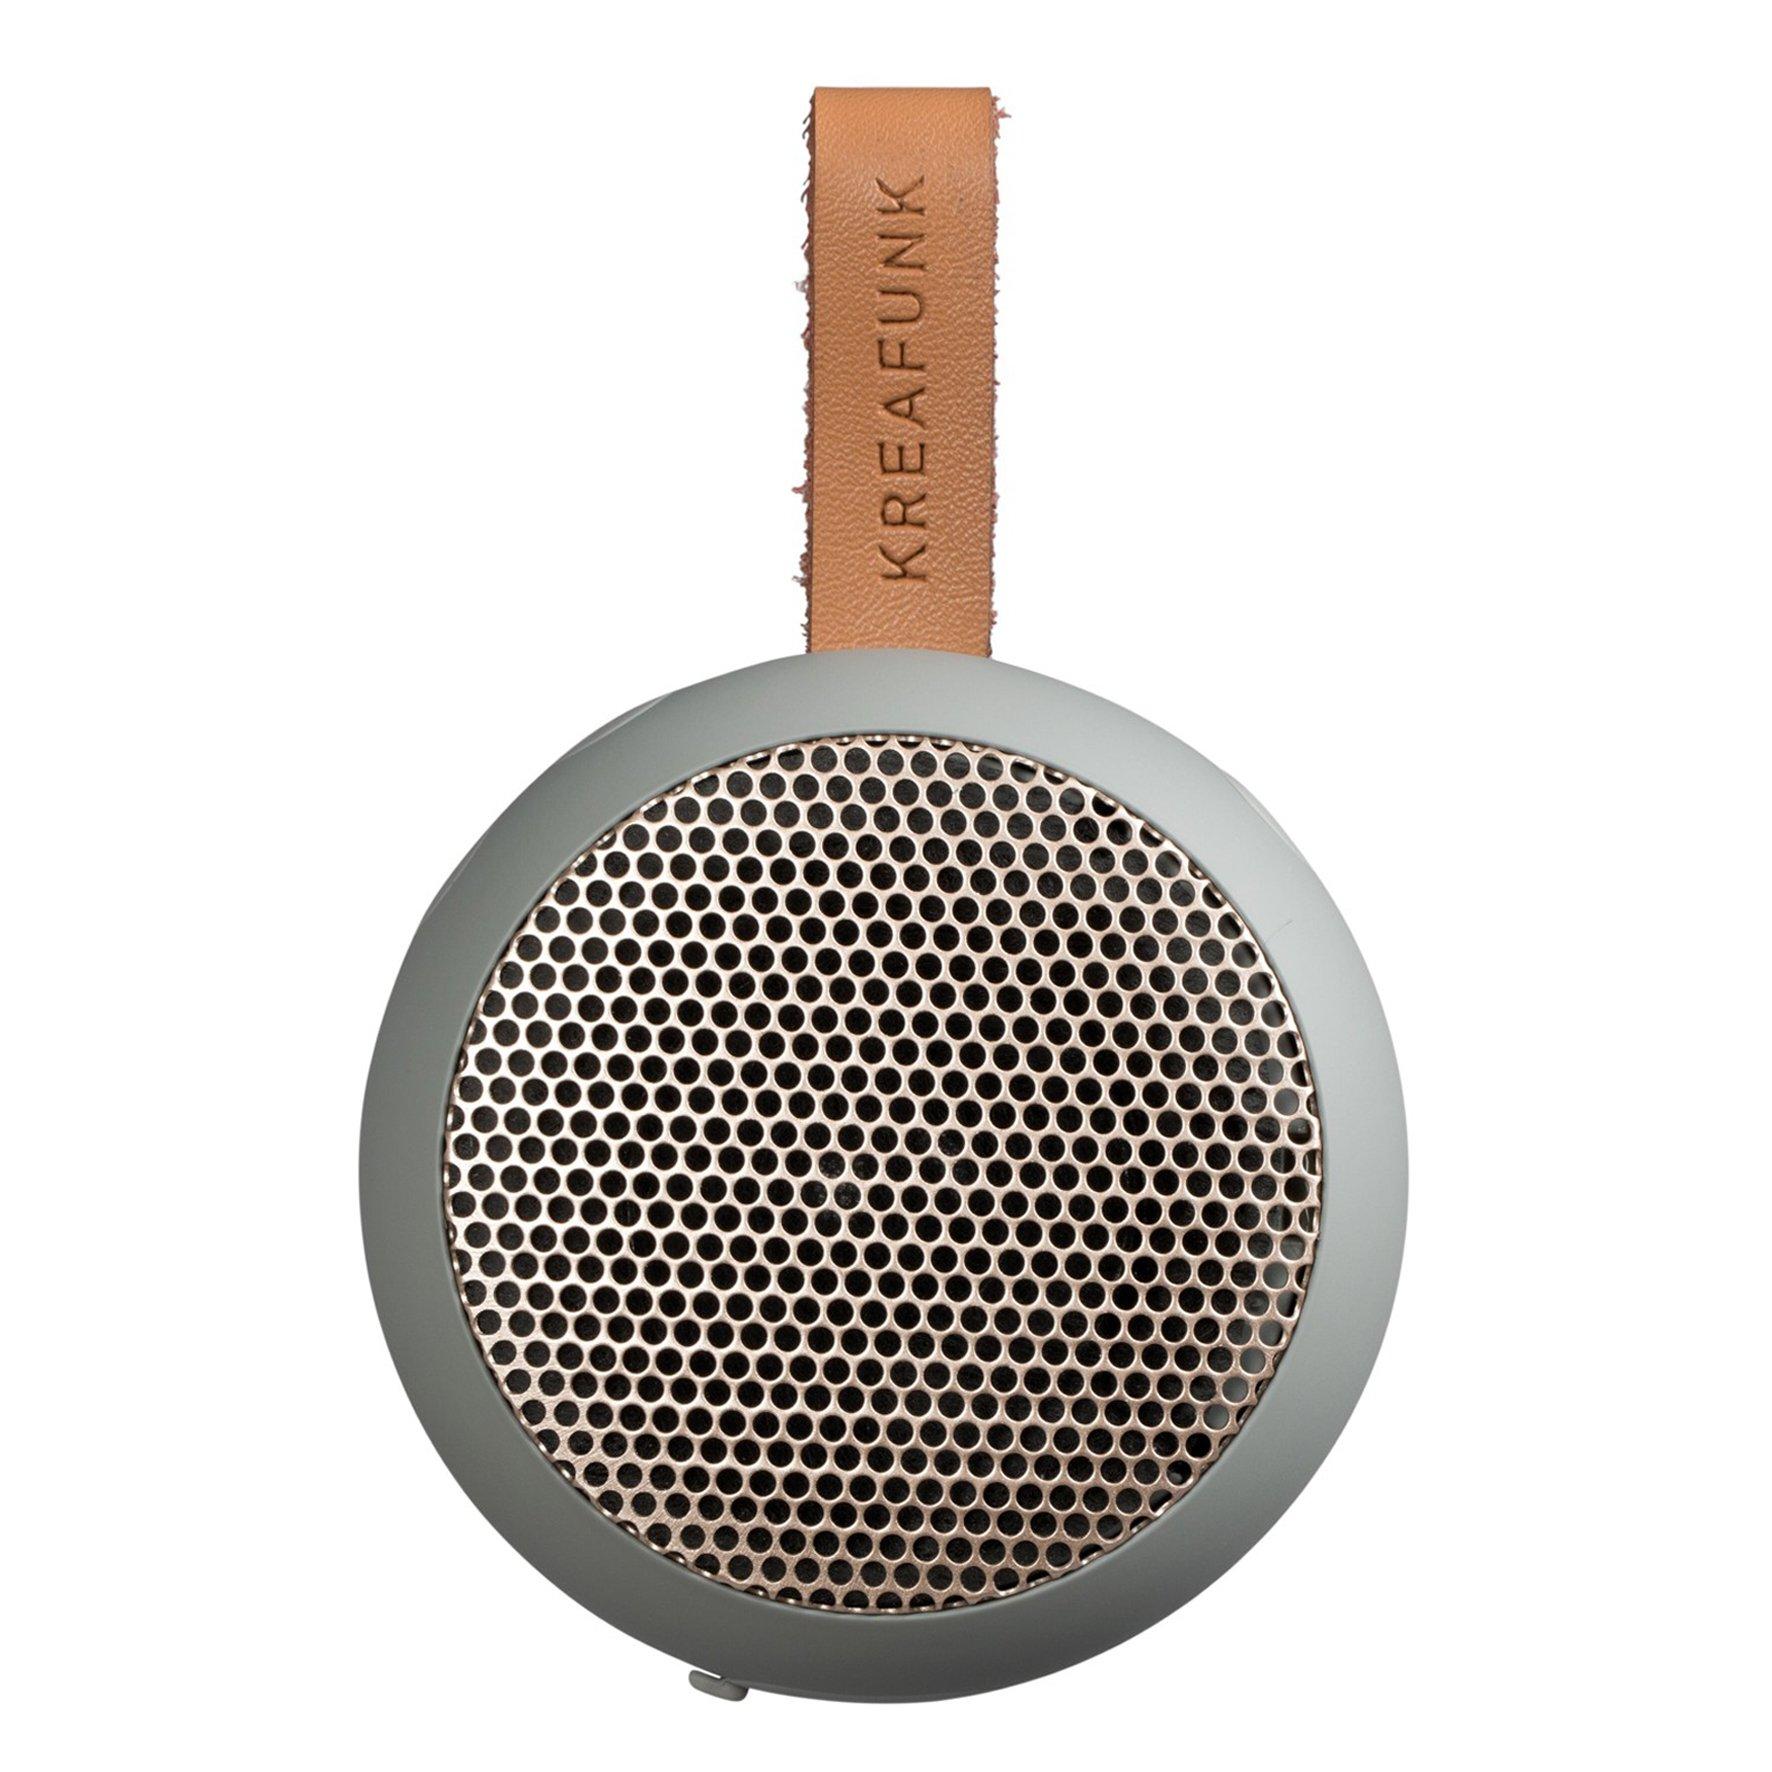 KreaFunk - aGO Bluetooth Speaker - Cool Grey/Rose Gold Grill (Kfwt34)